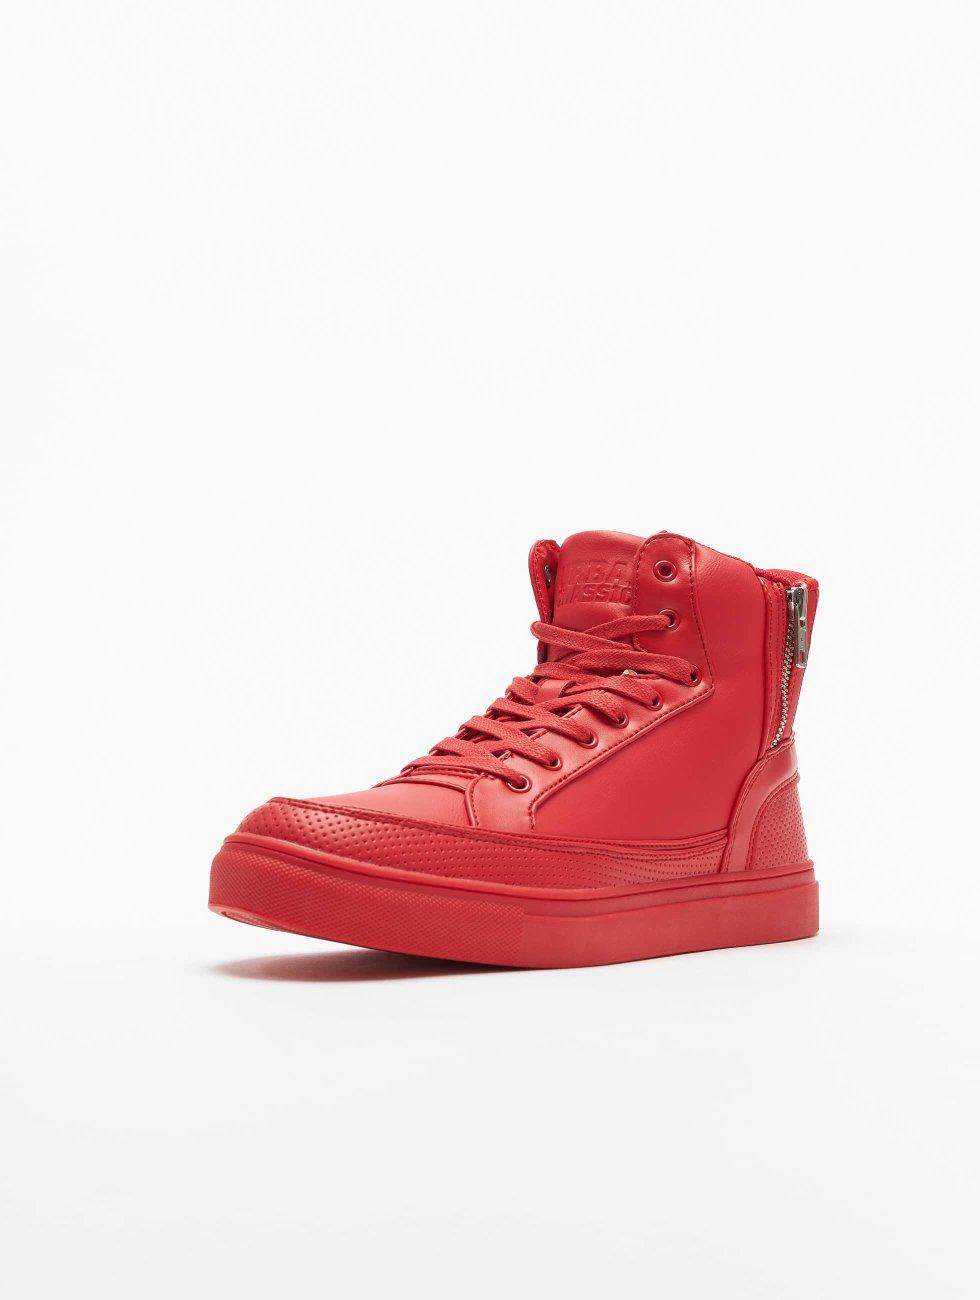 Urban Classics Sneakers Zipper red